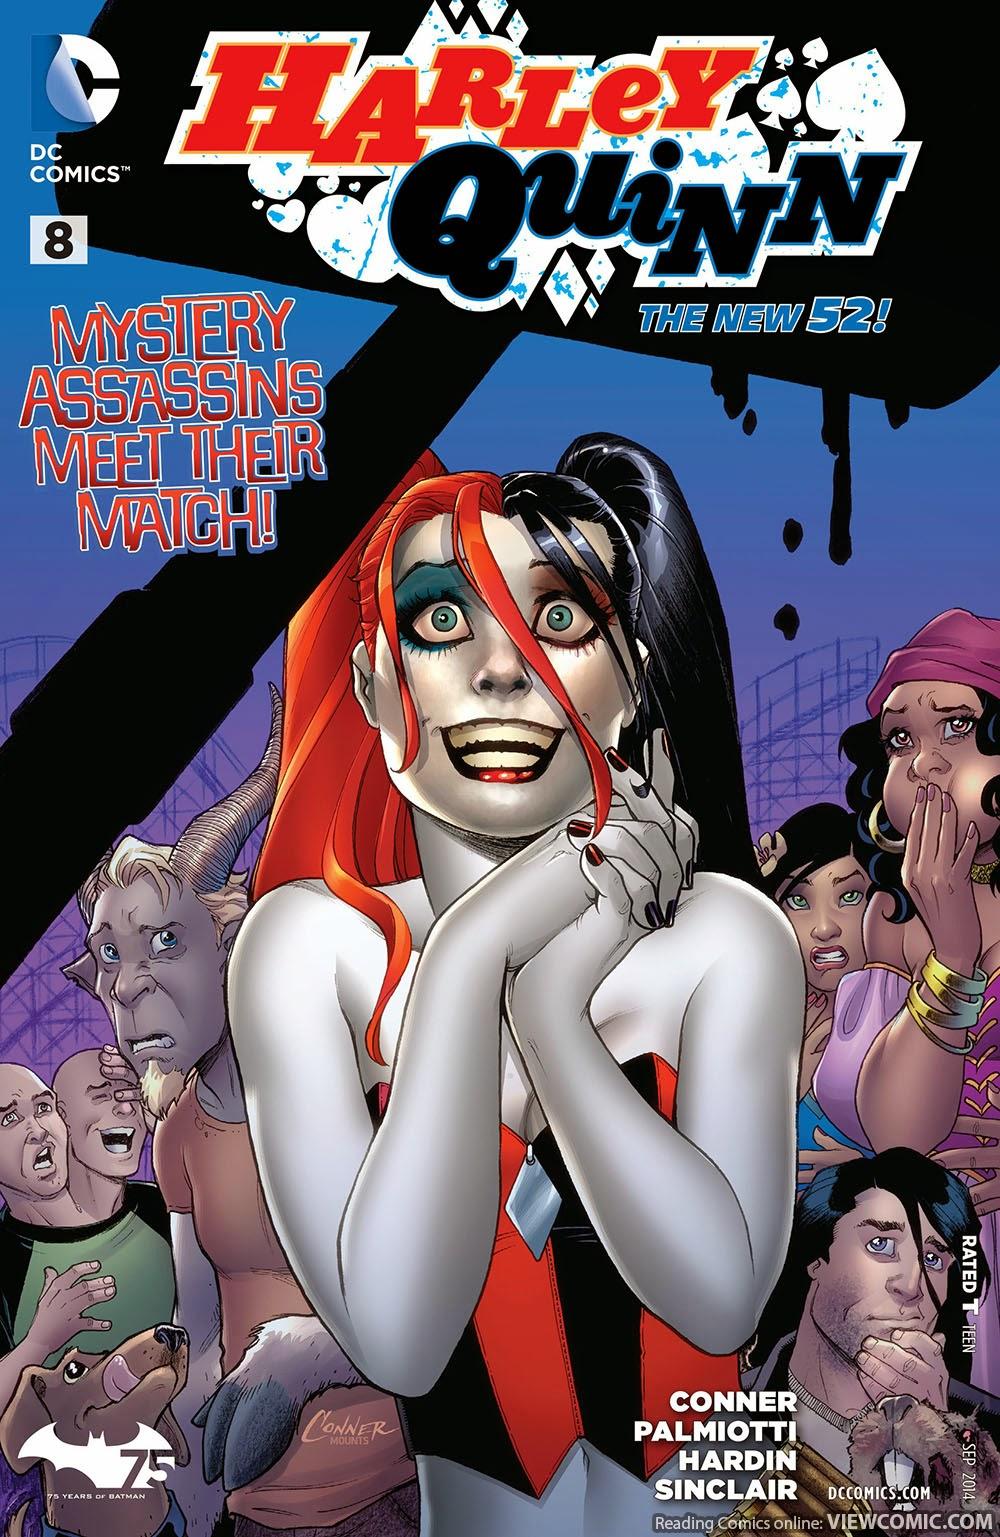 harley quinn 008 2014 viewcomic reading comics online